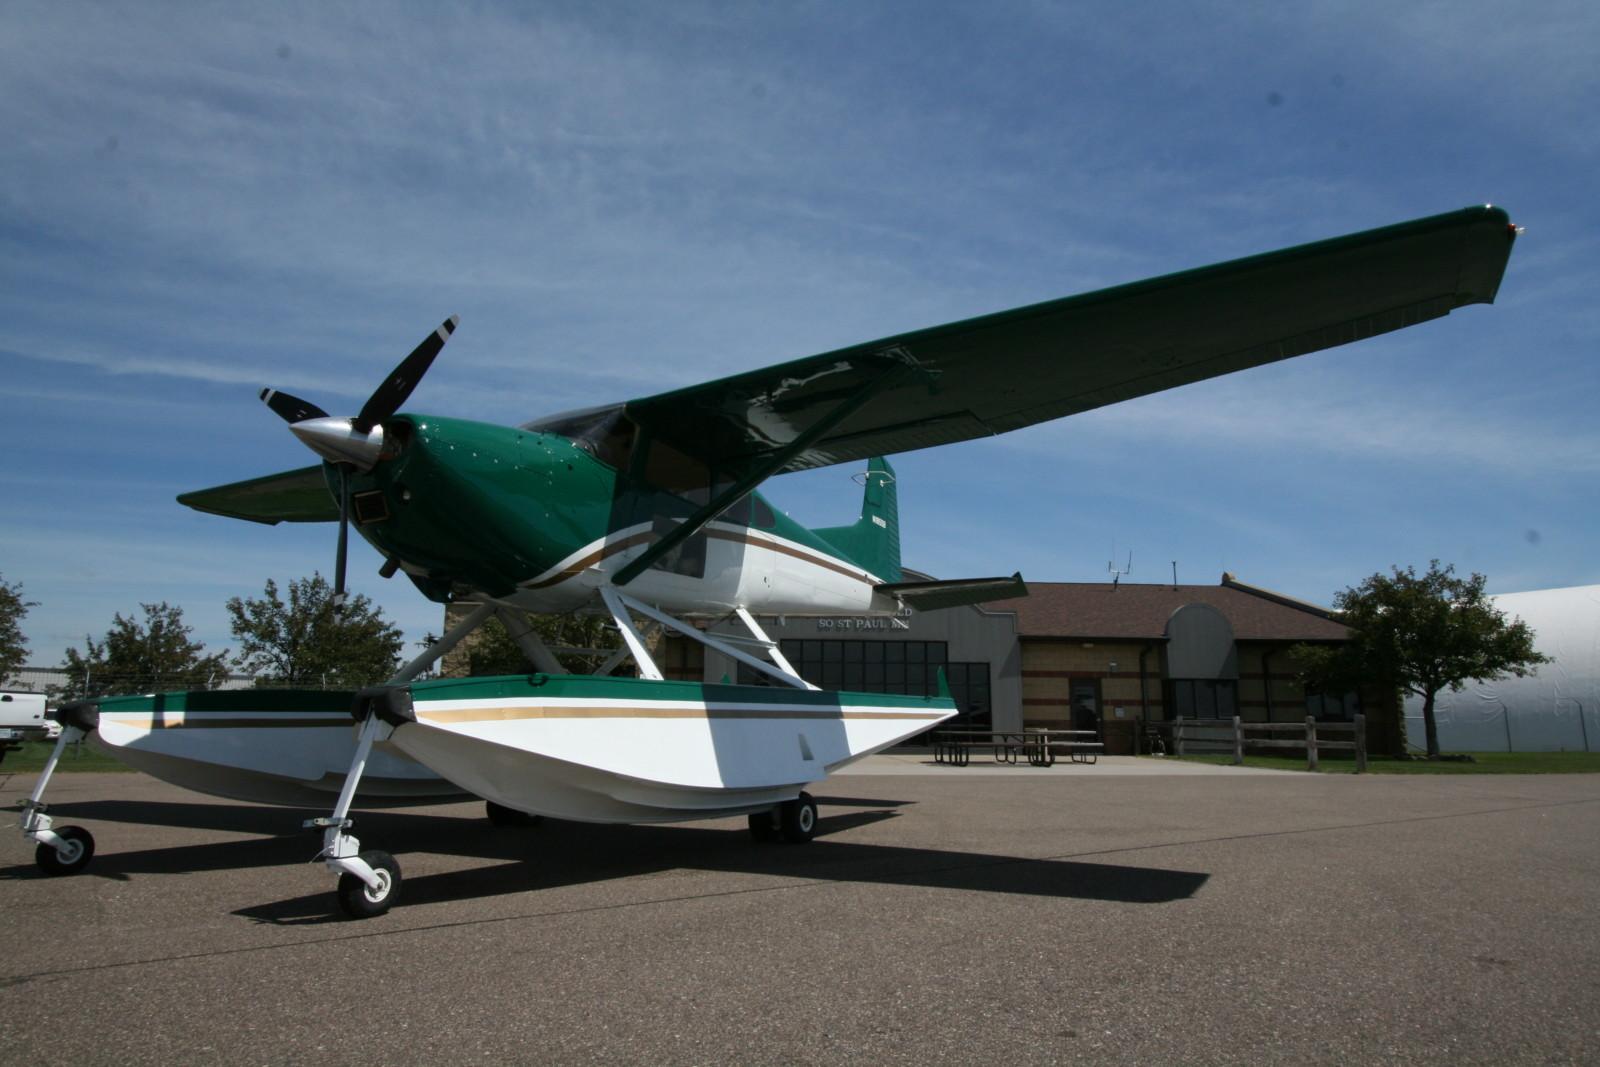 SOLD 1980 Cessna A185F Amphibian | Wipaire, Inc